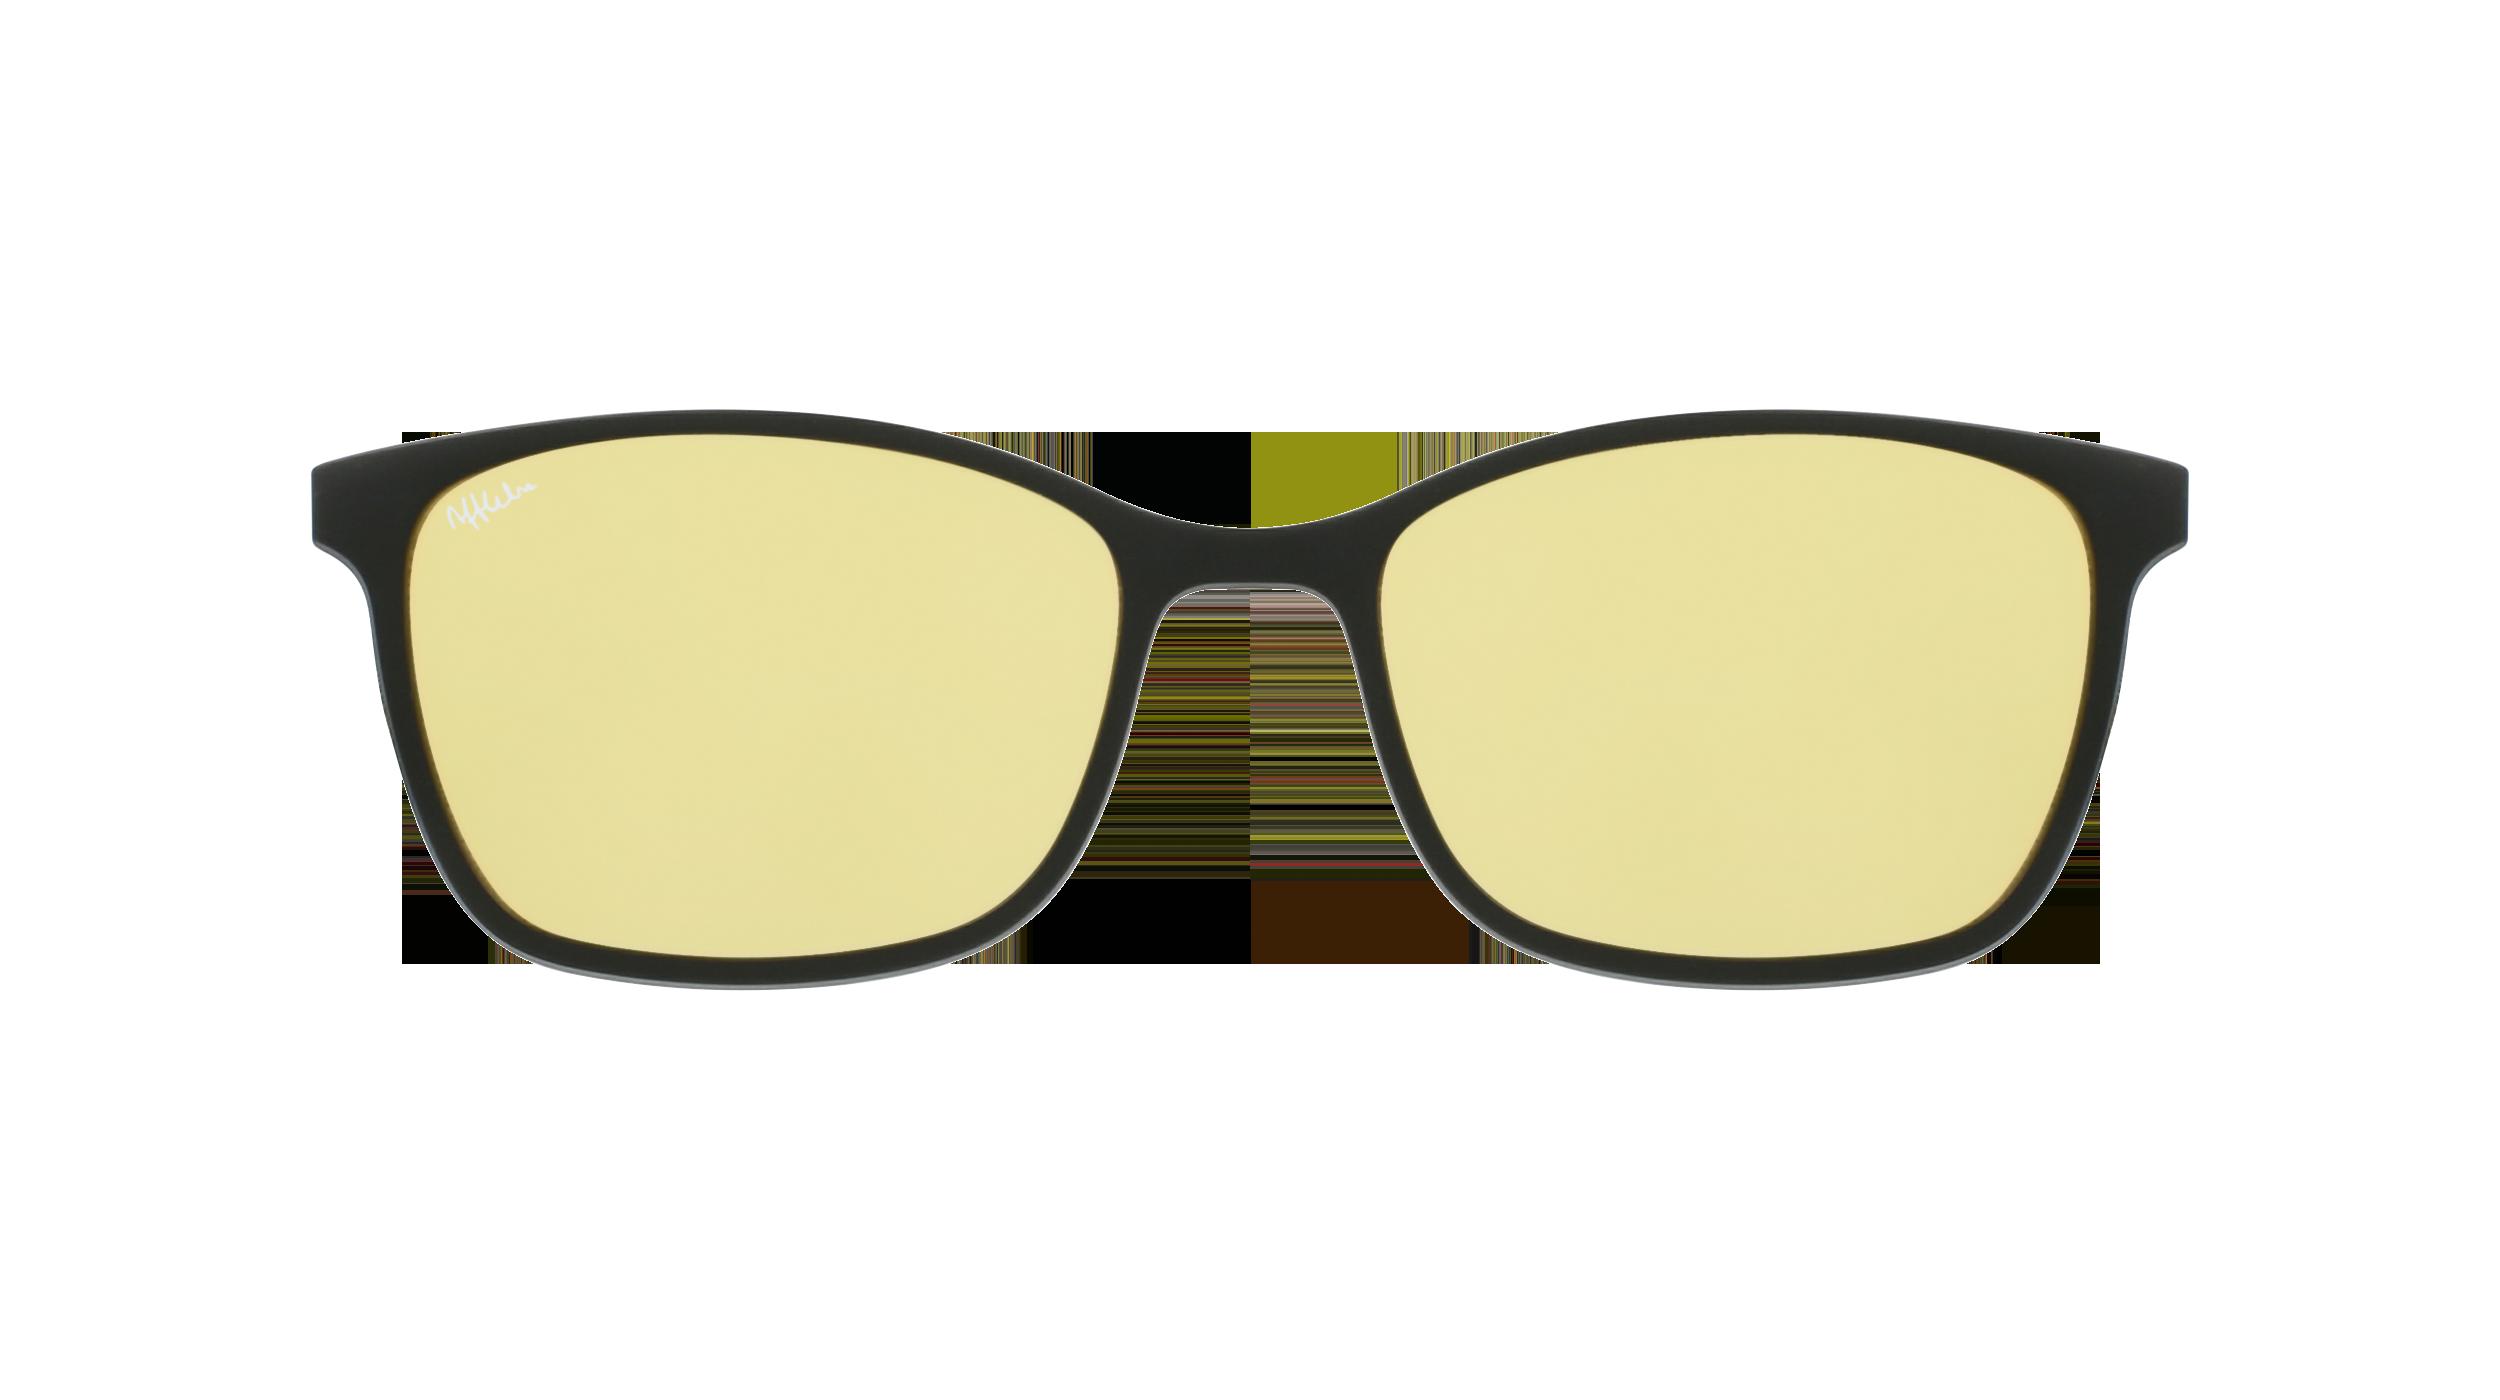 afflelou/france/products/smart_clip/clips_glasses/07630036459065.png